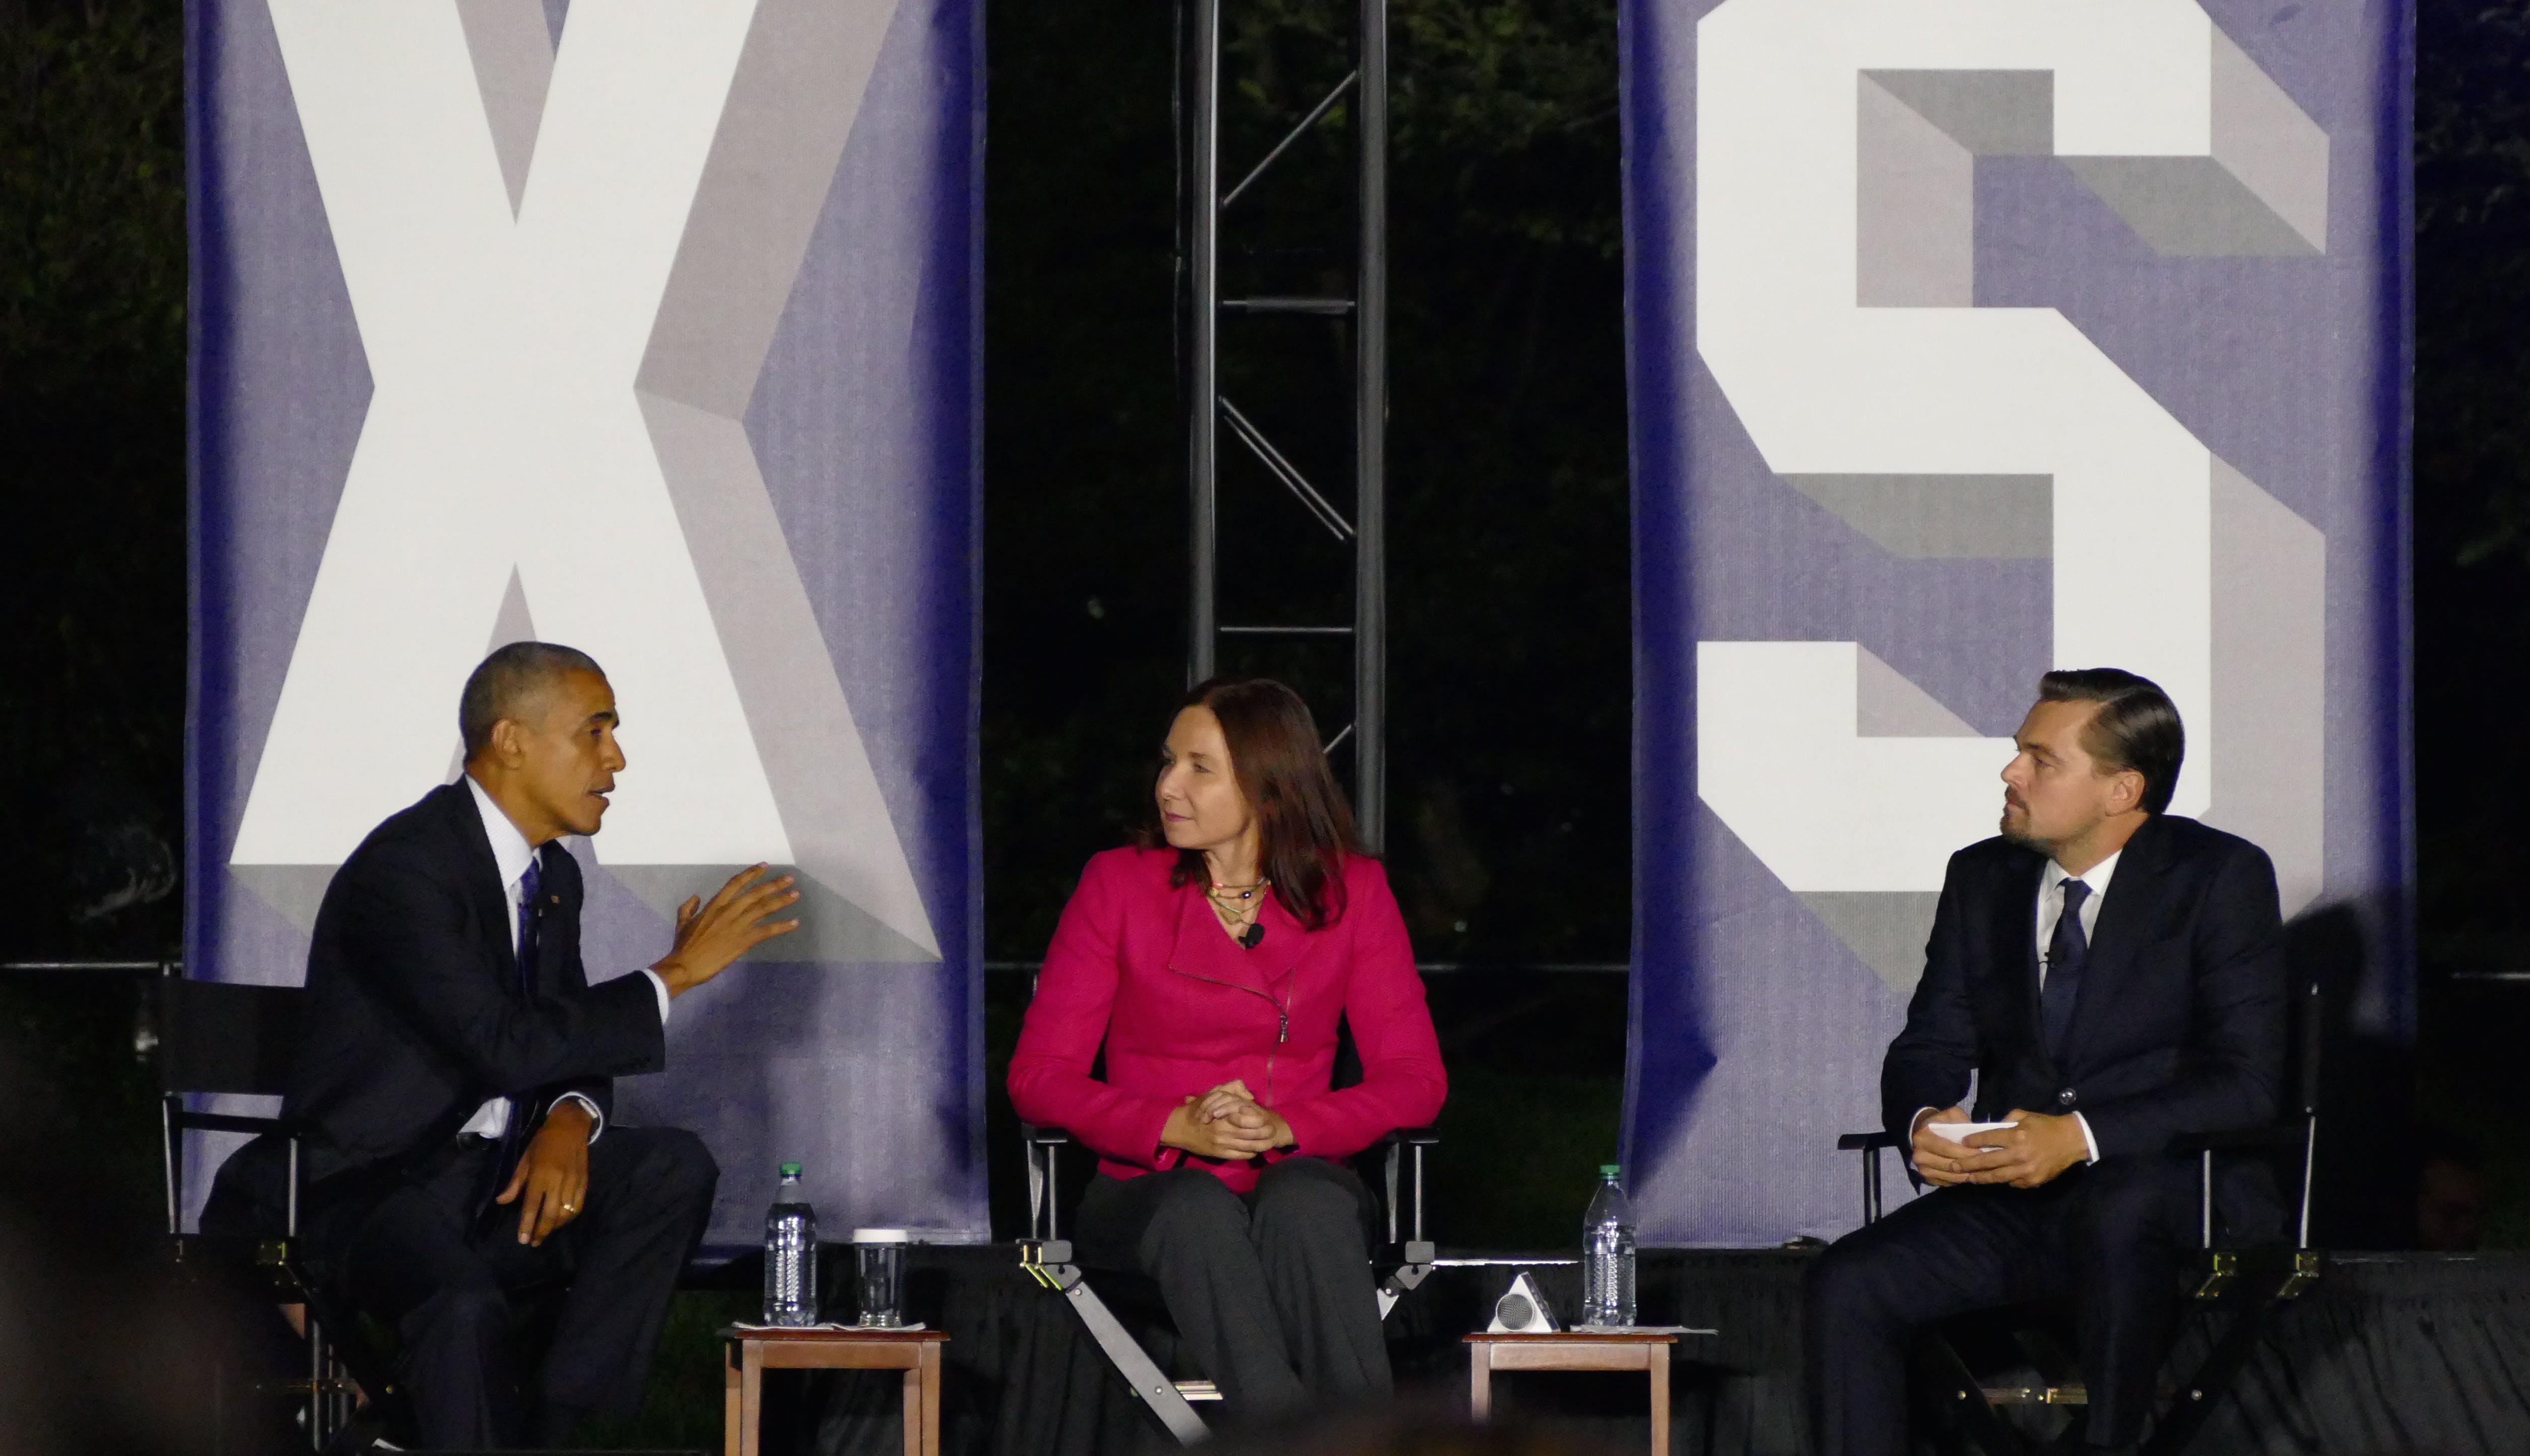 President Obama, Dr. Katharine Hayhoe, and Leonardo DiCaprio